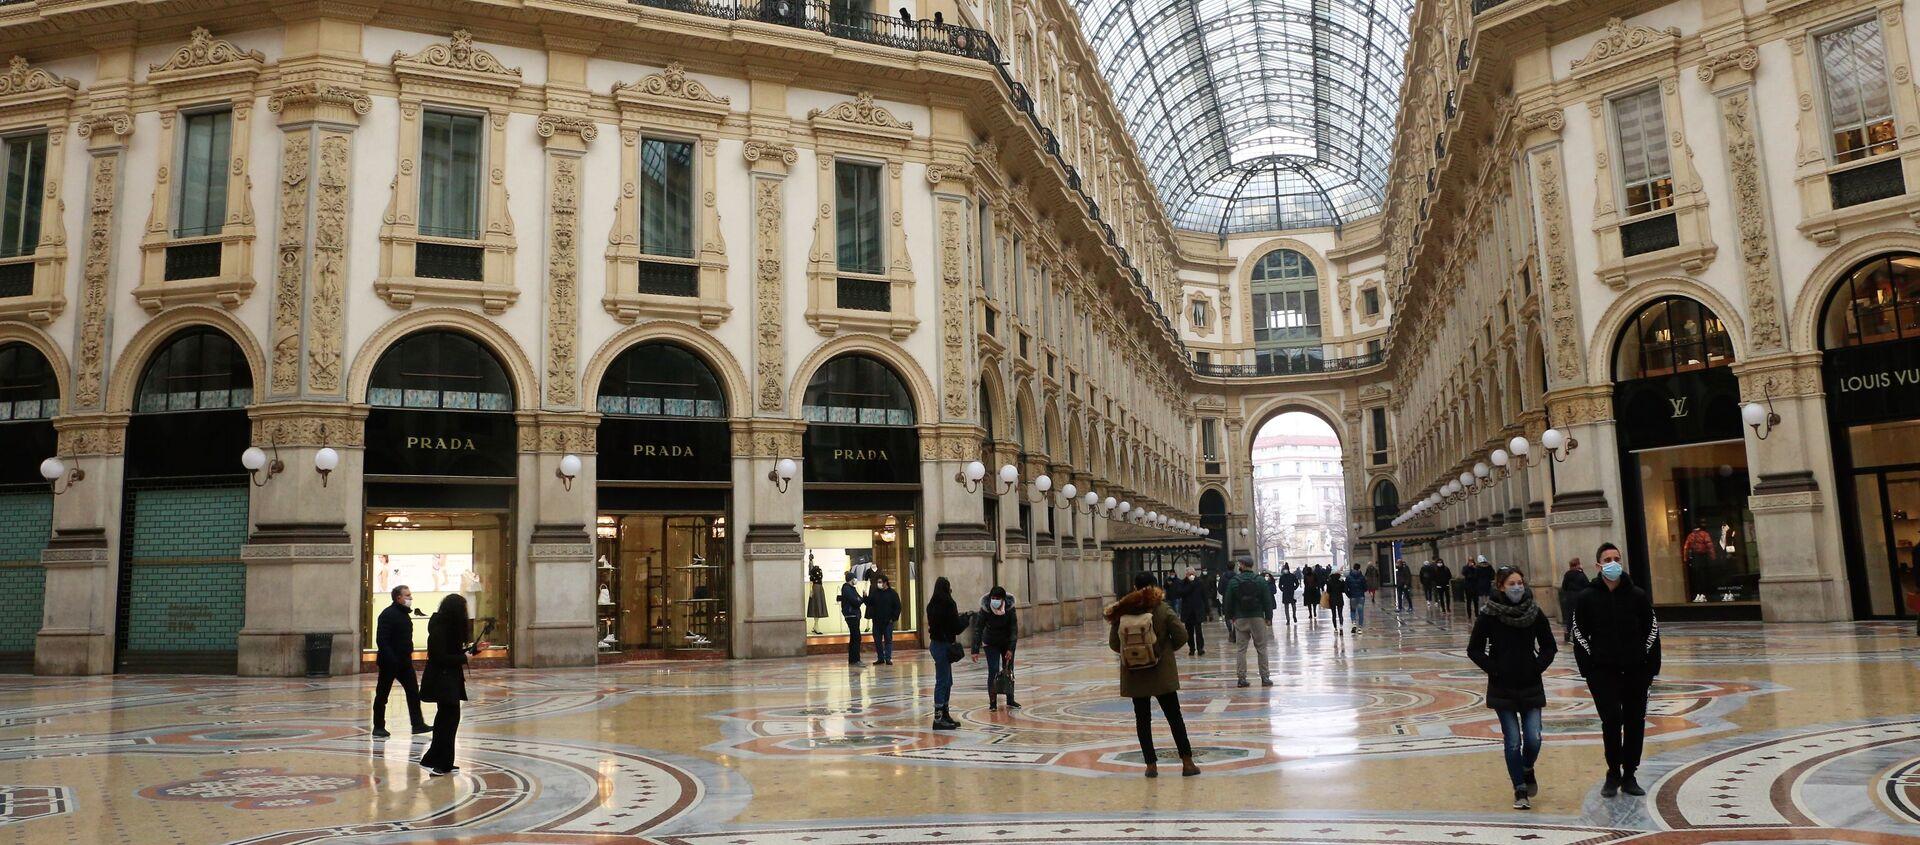 La galleria Vittorio Emanuele II semi-deserta a Milano, Italia - Sputnik Italia, 1920, 27.02.2021